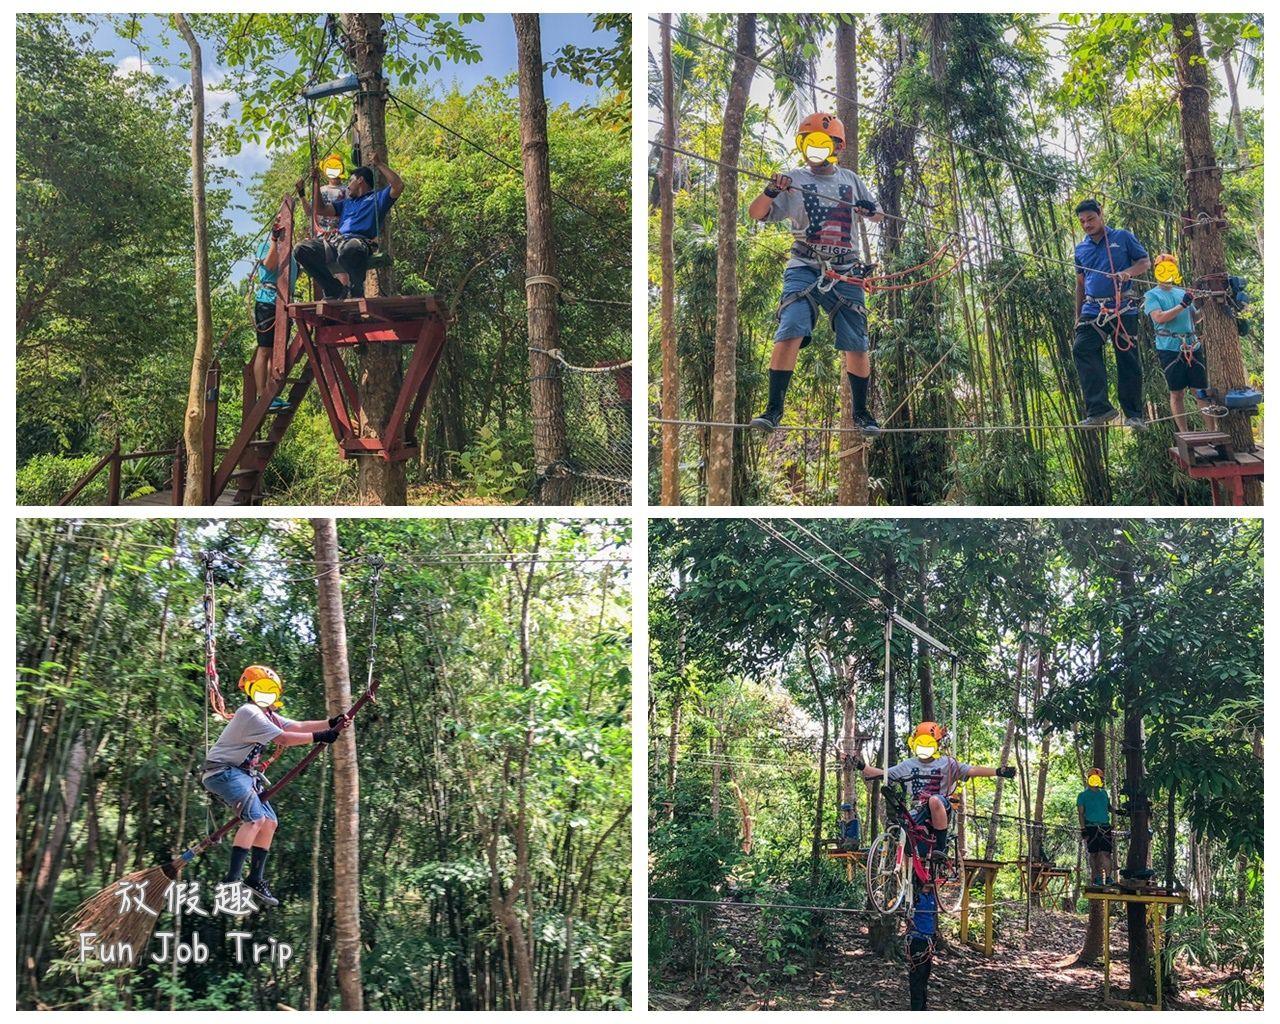 048 Aonang Fiore Resort.jpg